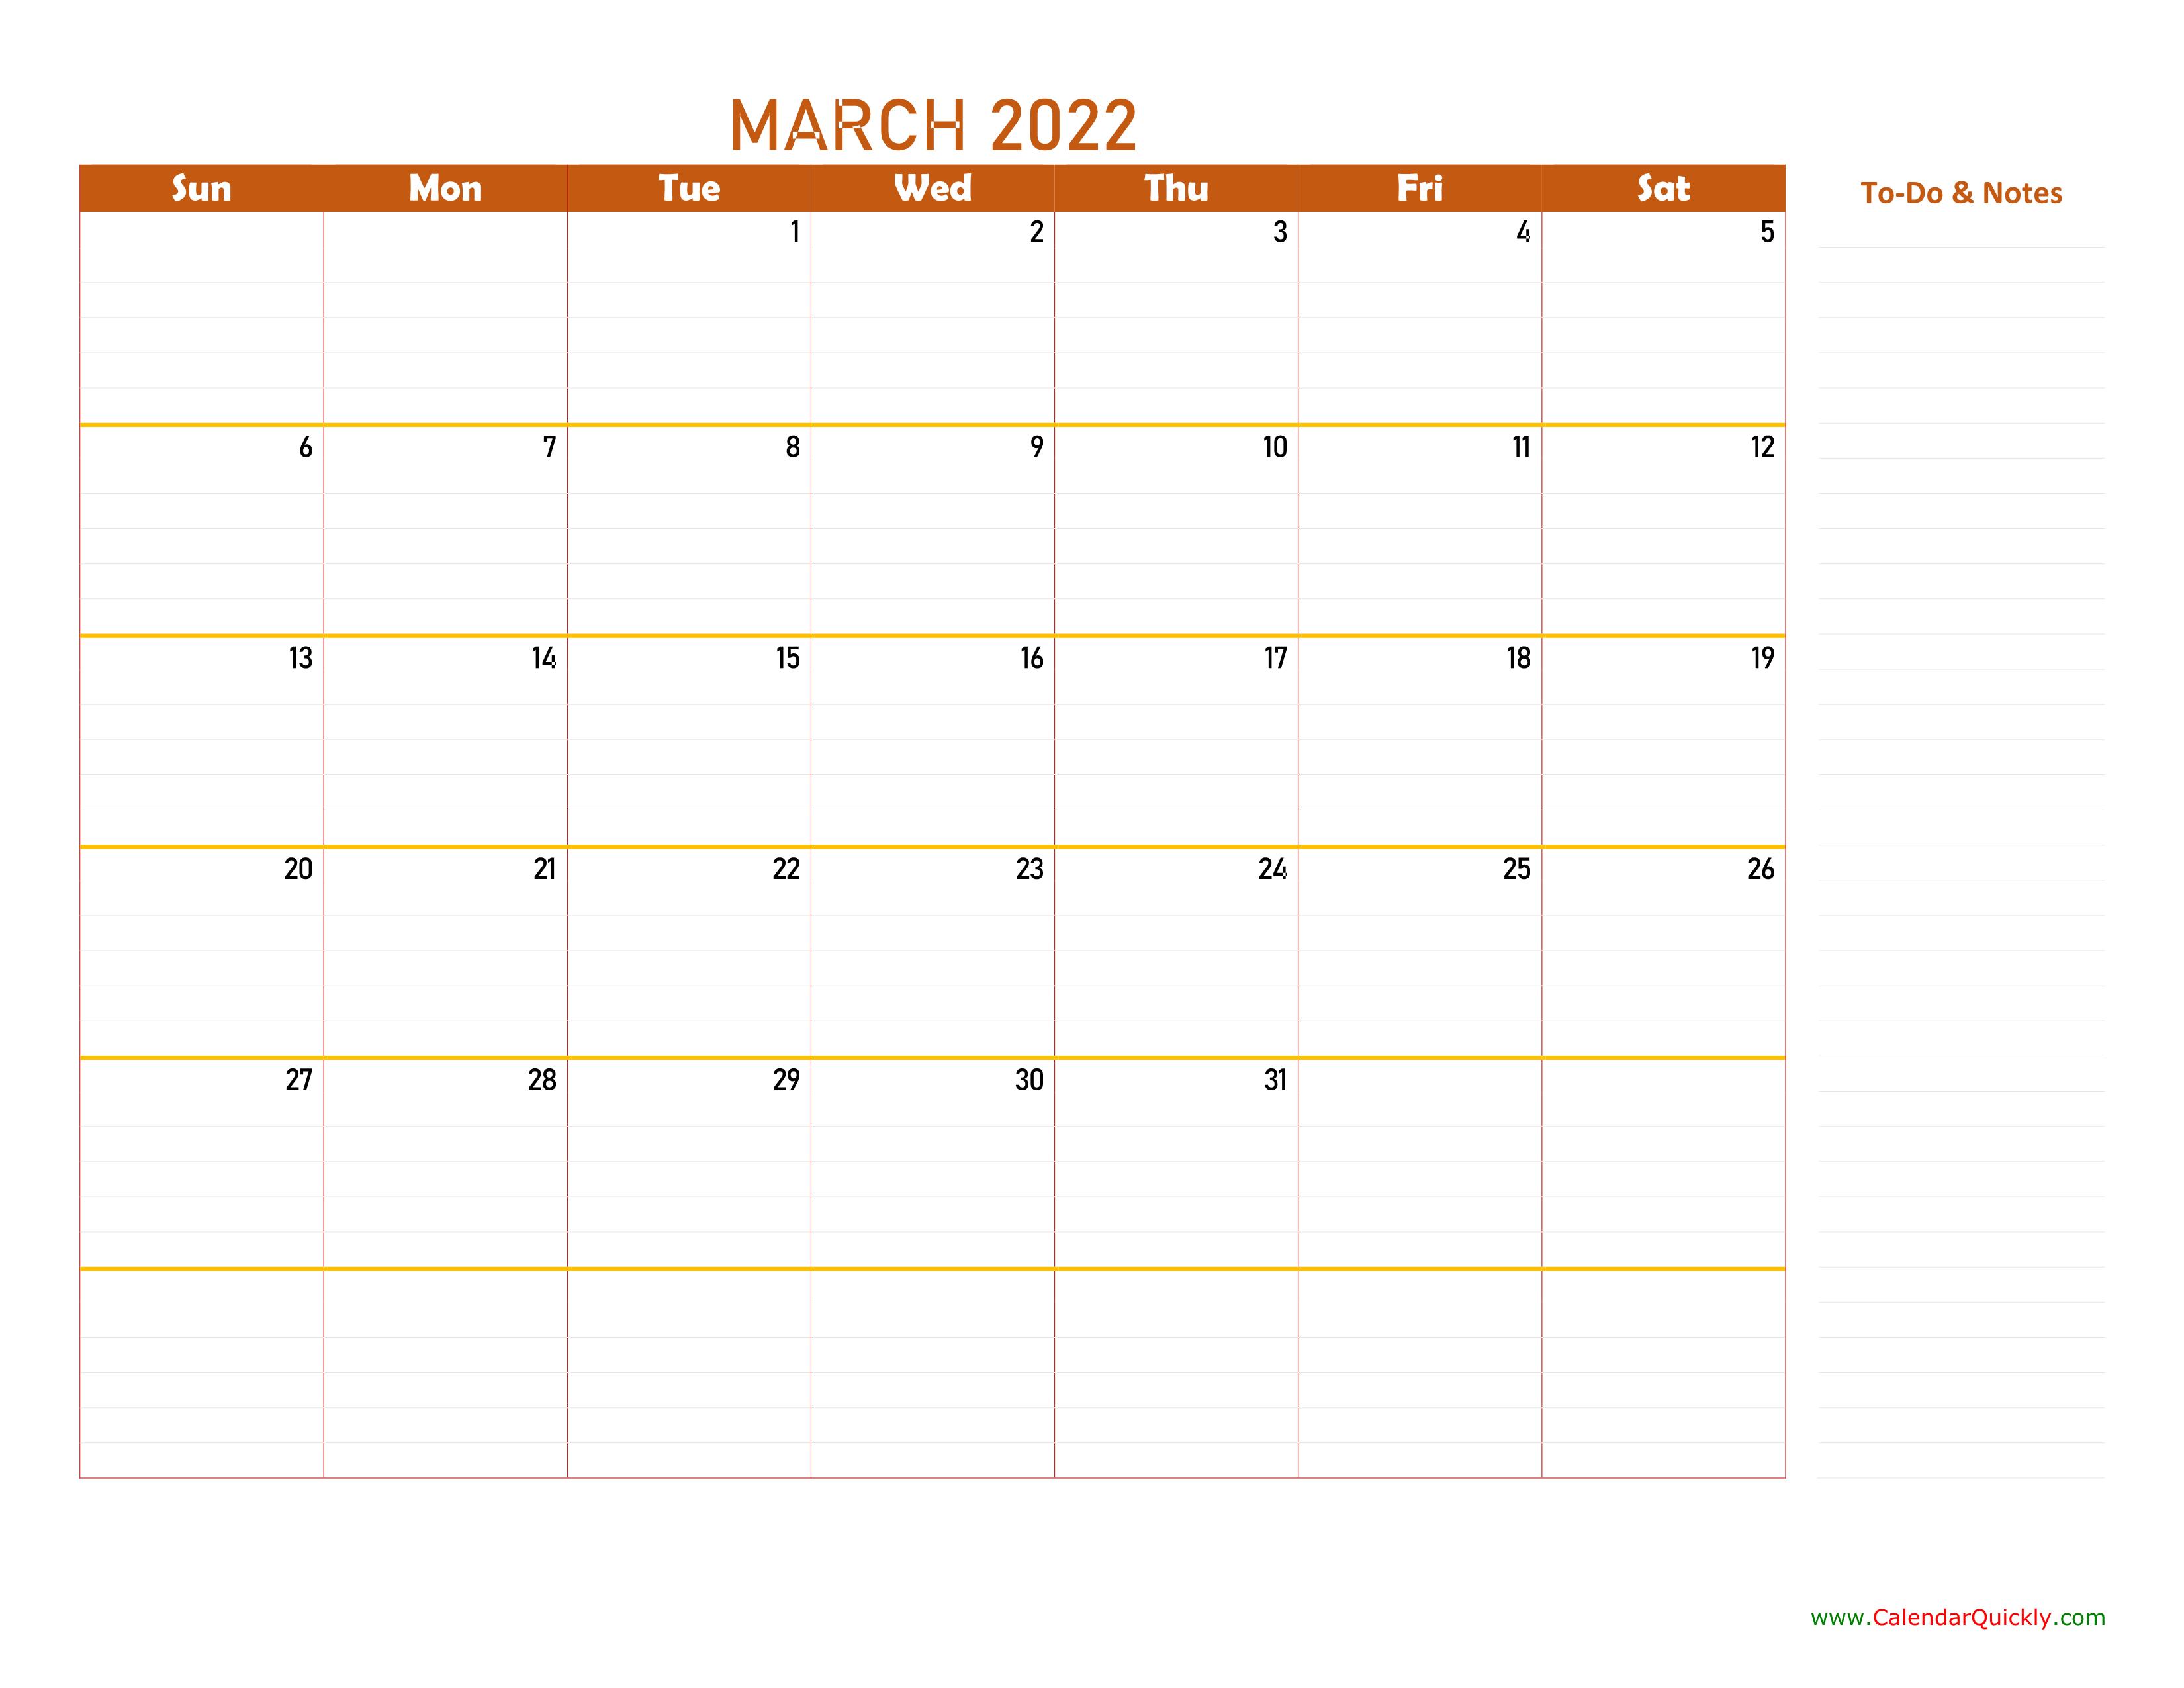 March 2022 Calendar | Calendar Quickly Pertaining To Calendar For March 2022